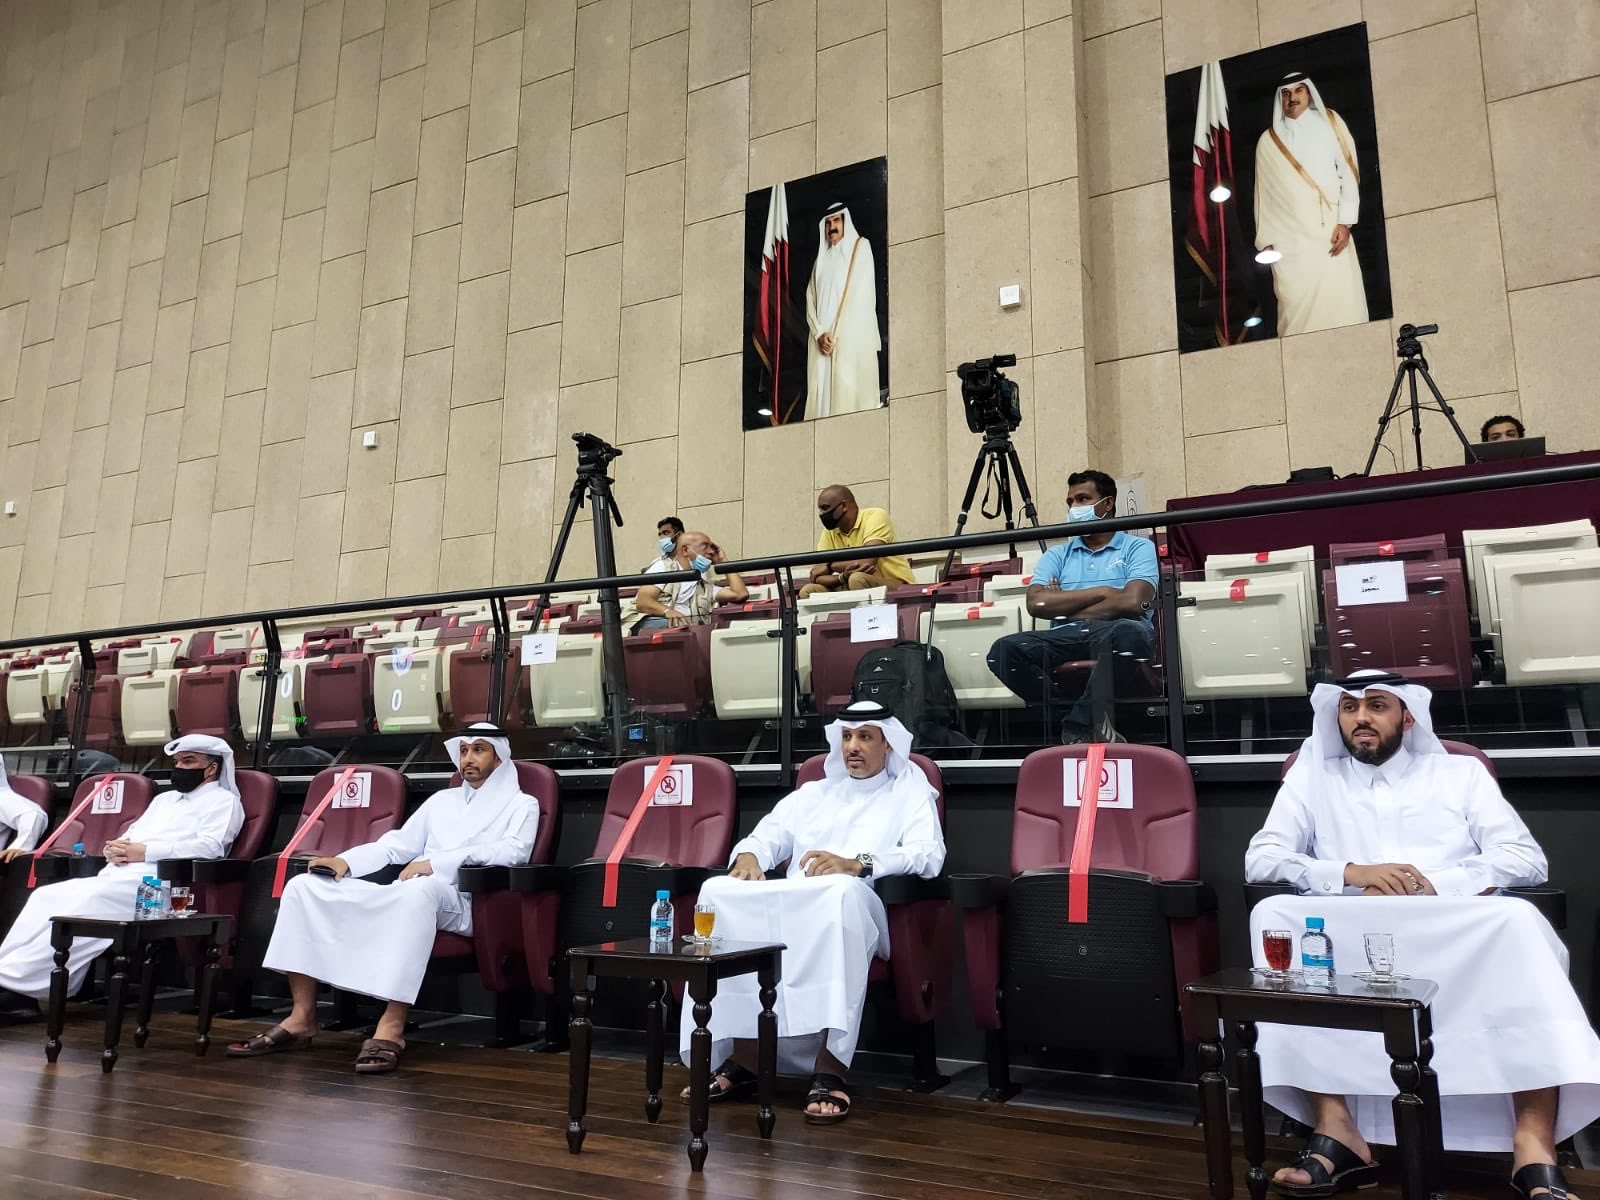 Al Arabi Champion of 3rd Edition of Qatar Men's Volleyball Championship